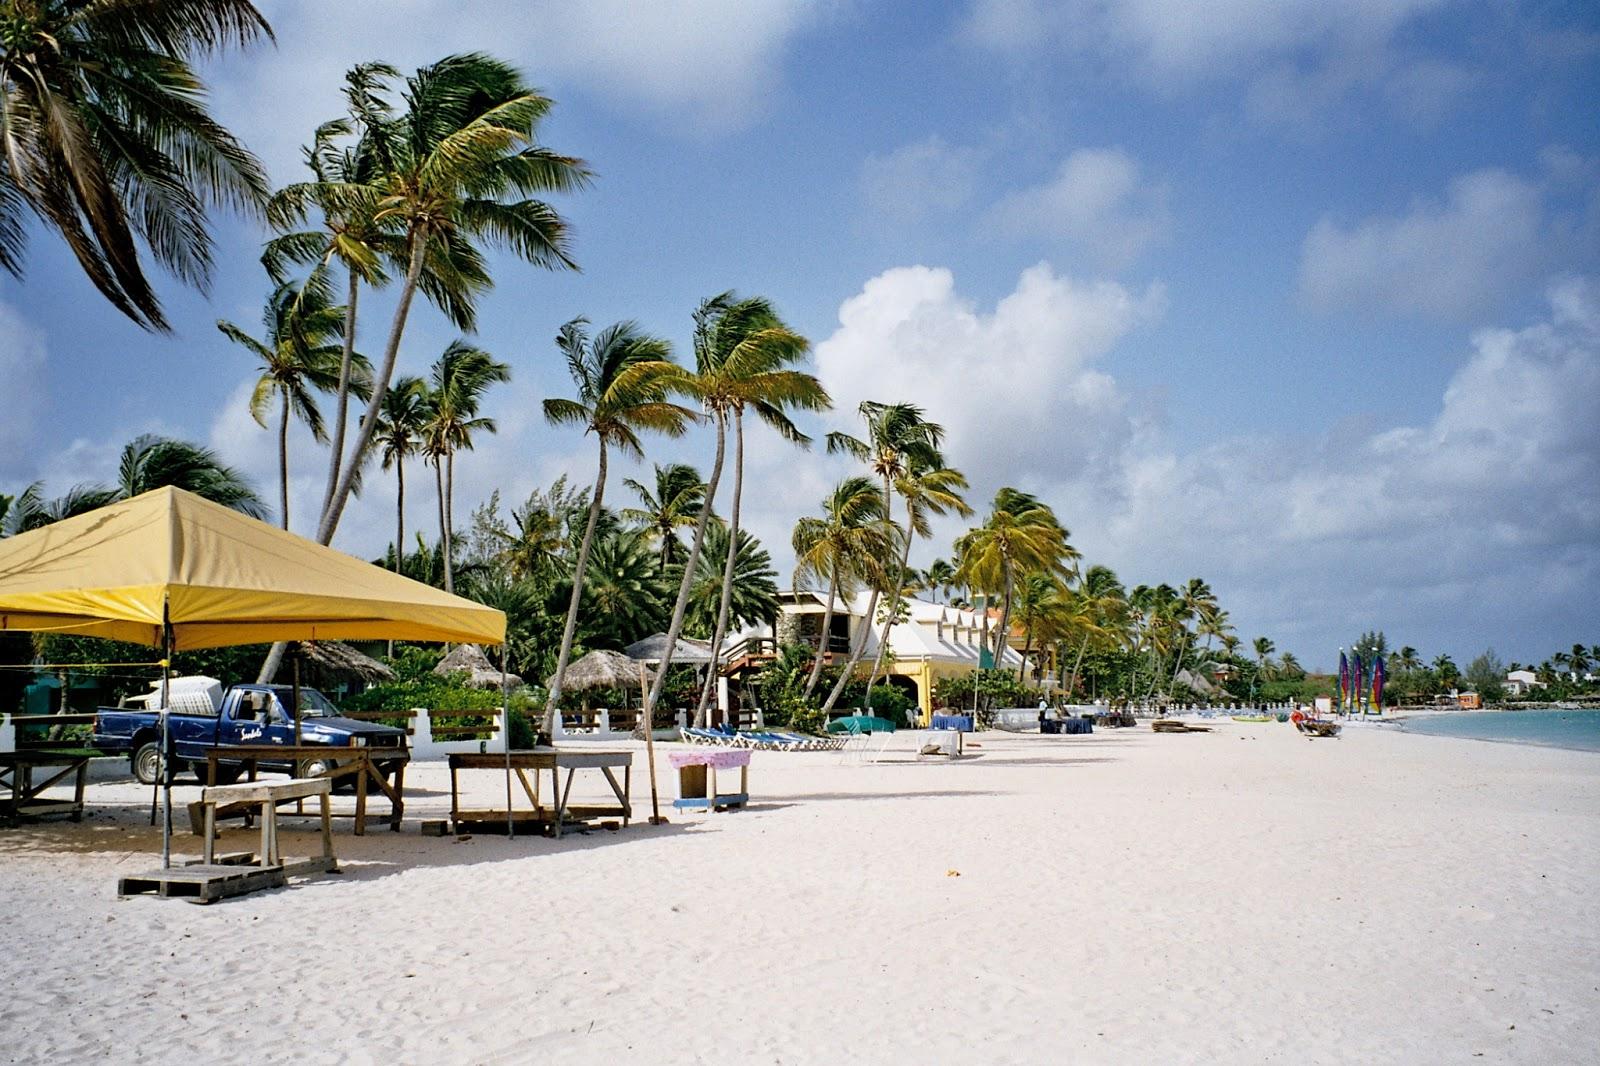 Beaches Images Desktop Wallpaper Download Beach Backgrounds Nature